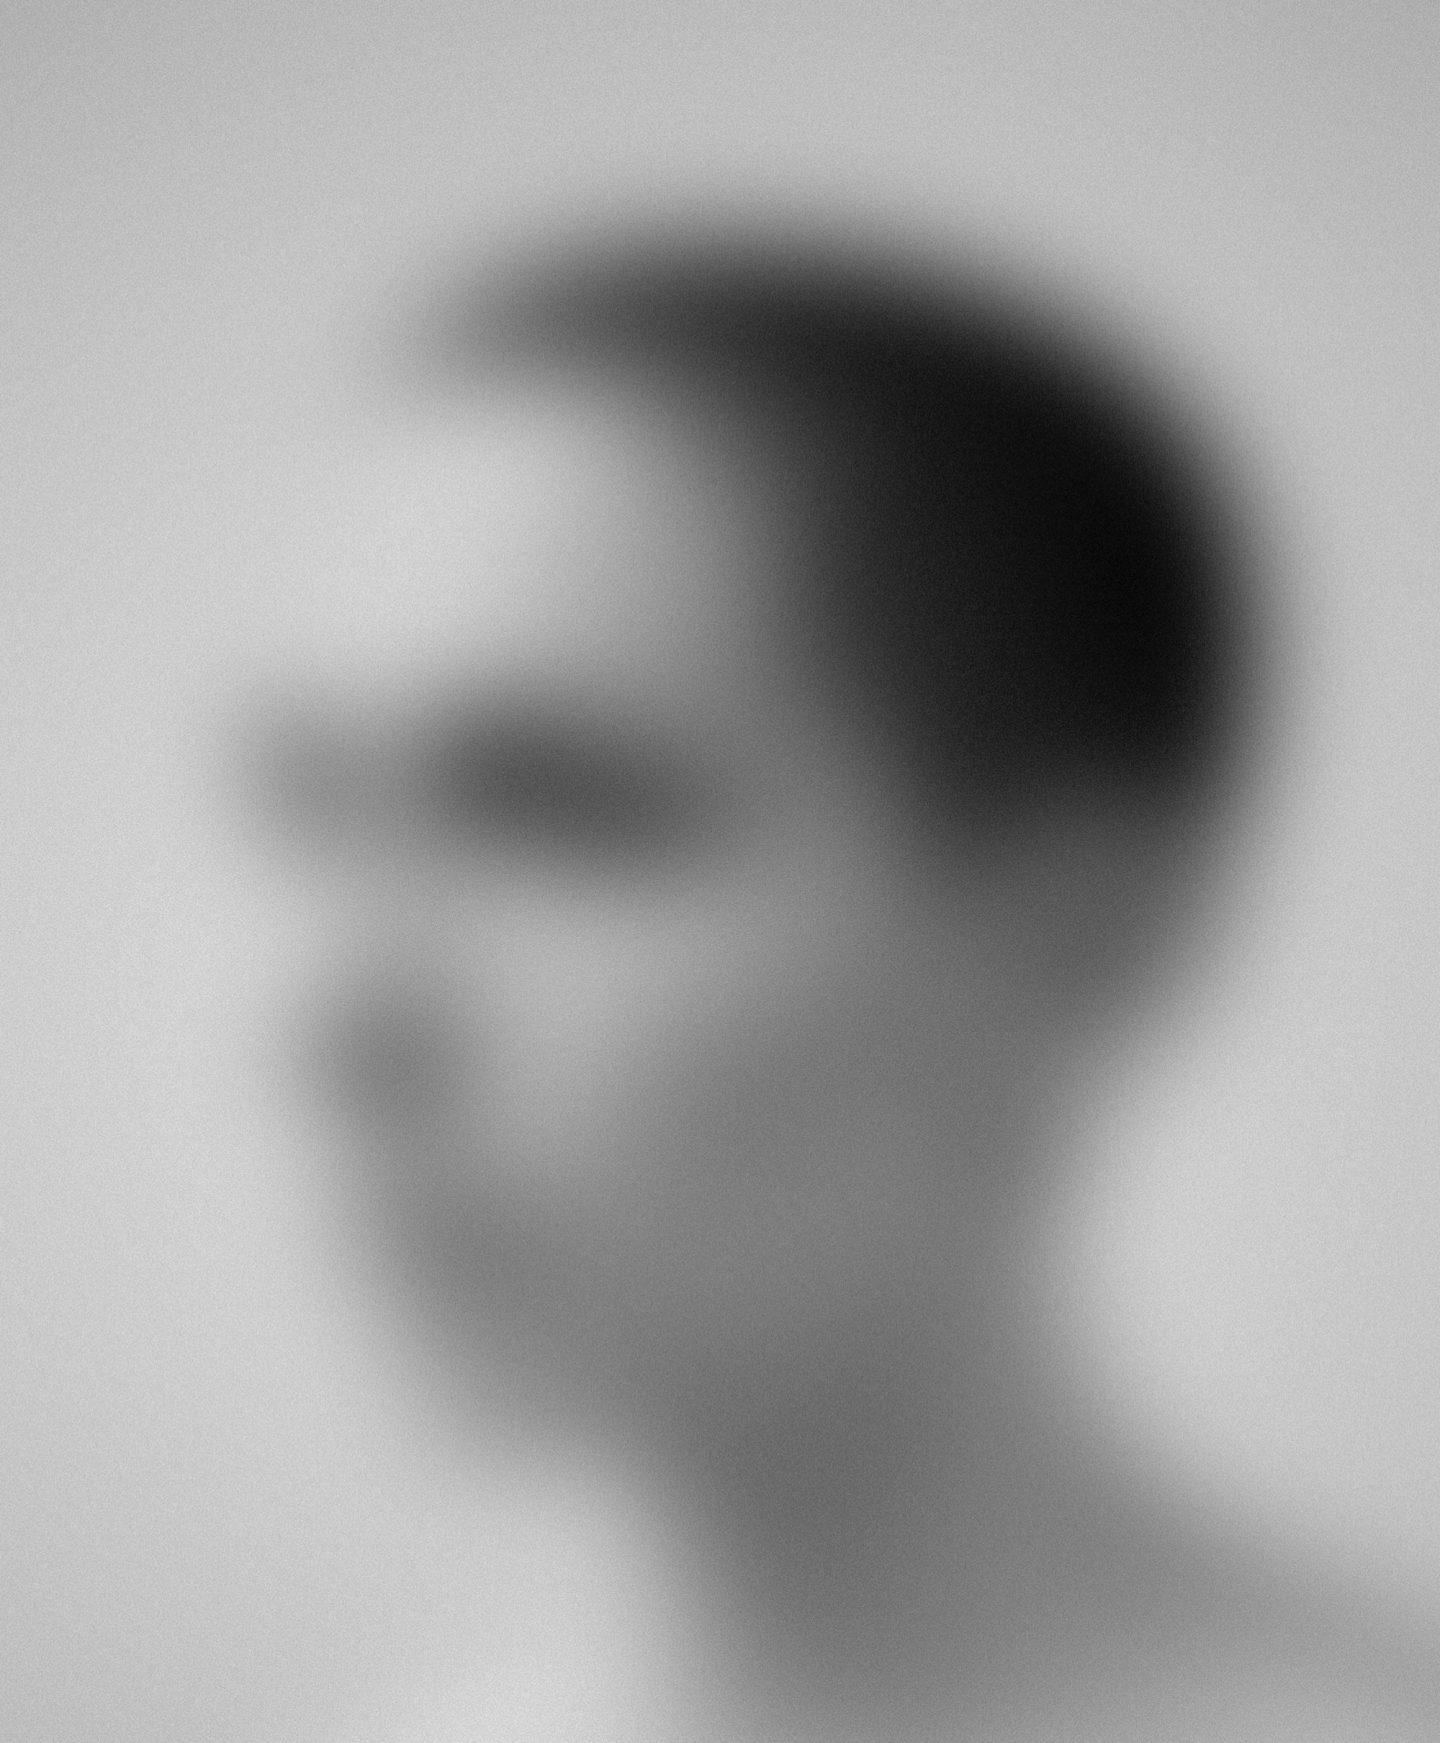 IGNANT-Photography-Alexandre-Souêtre-005